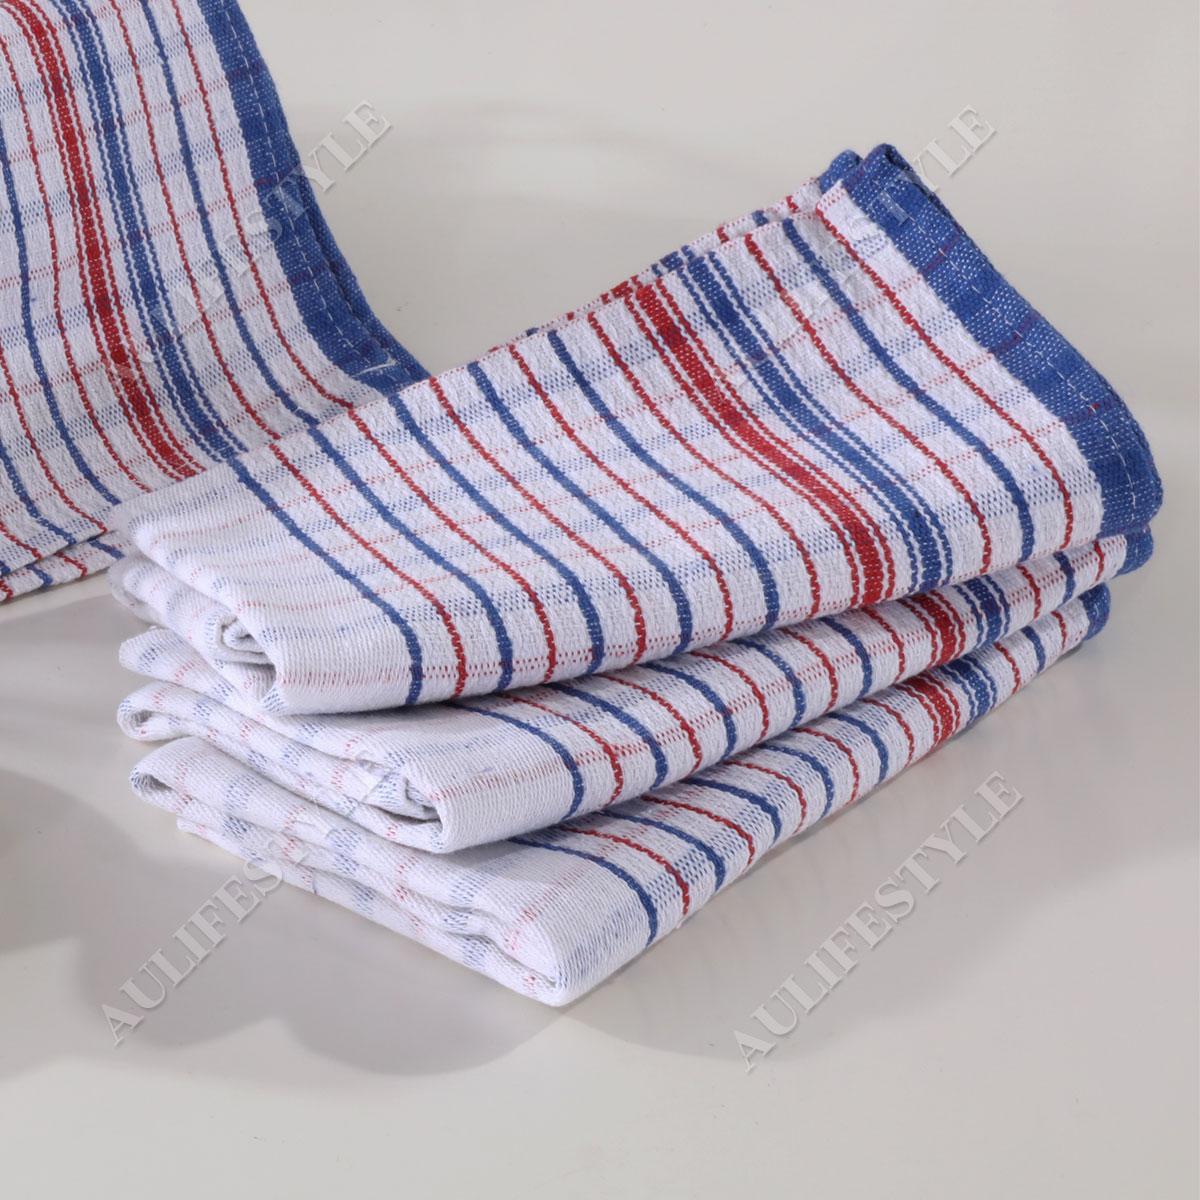 10x commercial grade vintage tea towels heavy duty 100. Black Bedroom Furniture Sets. Home Design Ideas